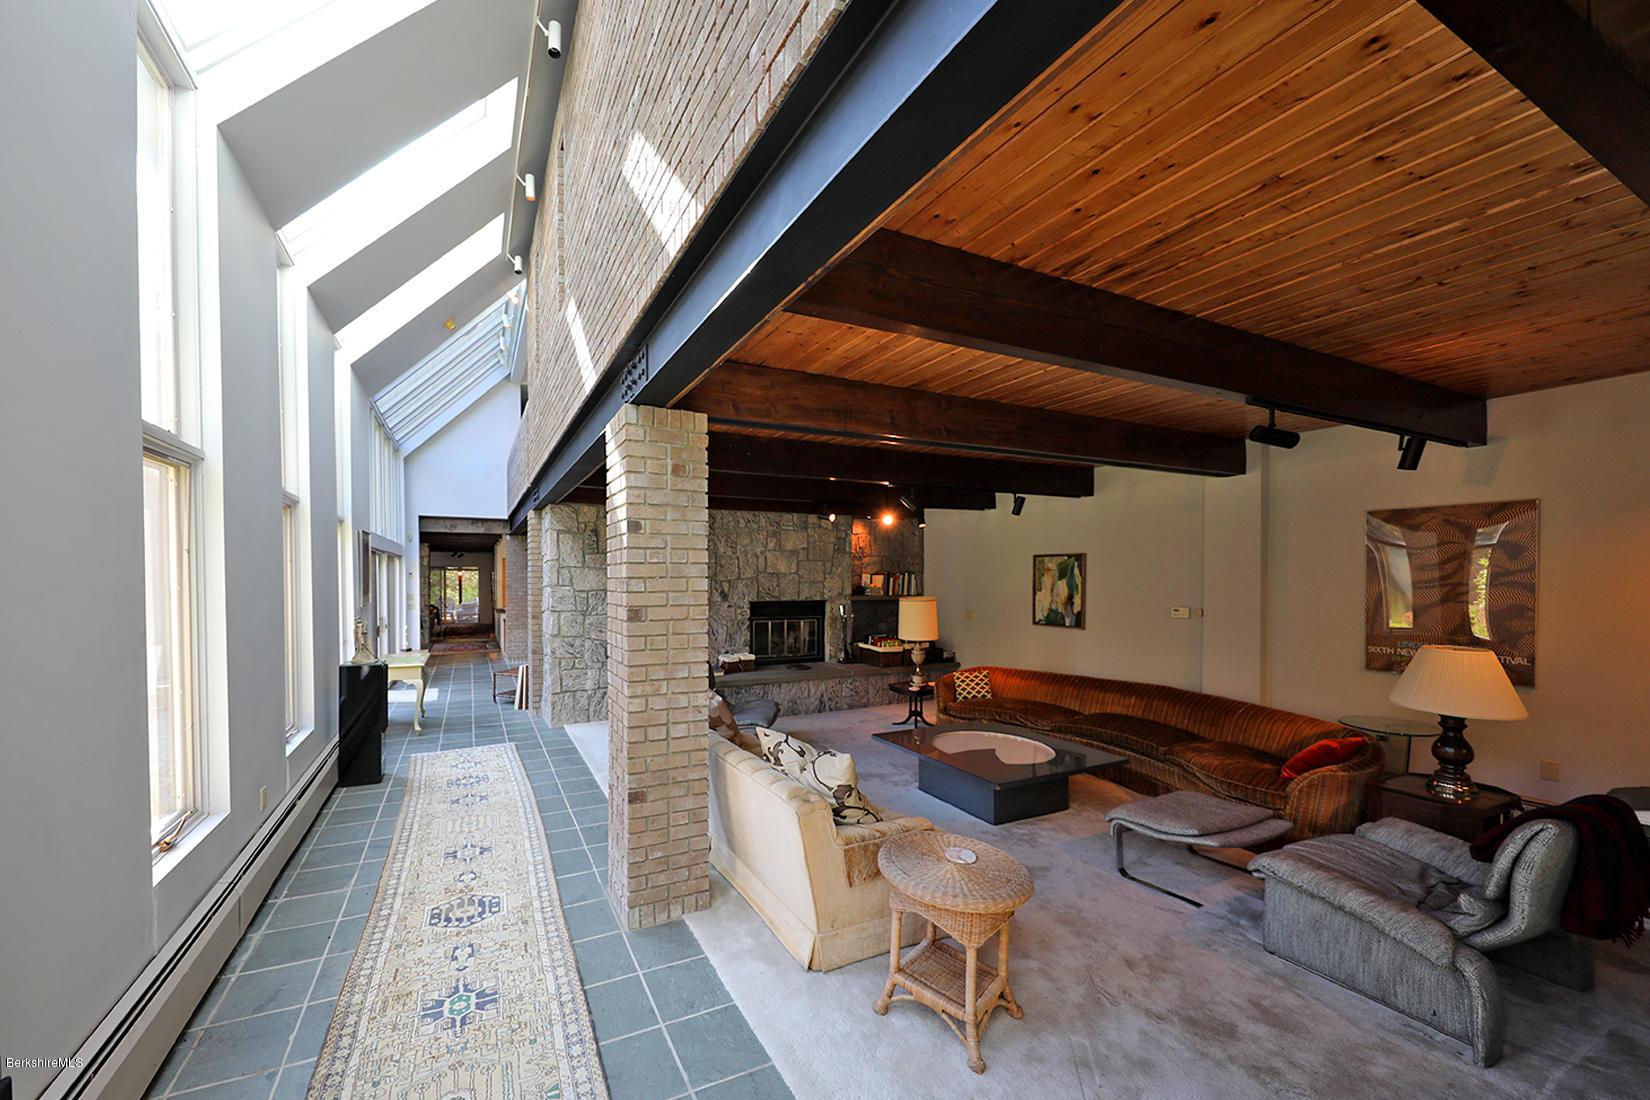 Property located at 55 Stratford Rd New Marlborough MA 01230 photo